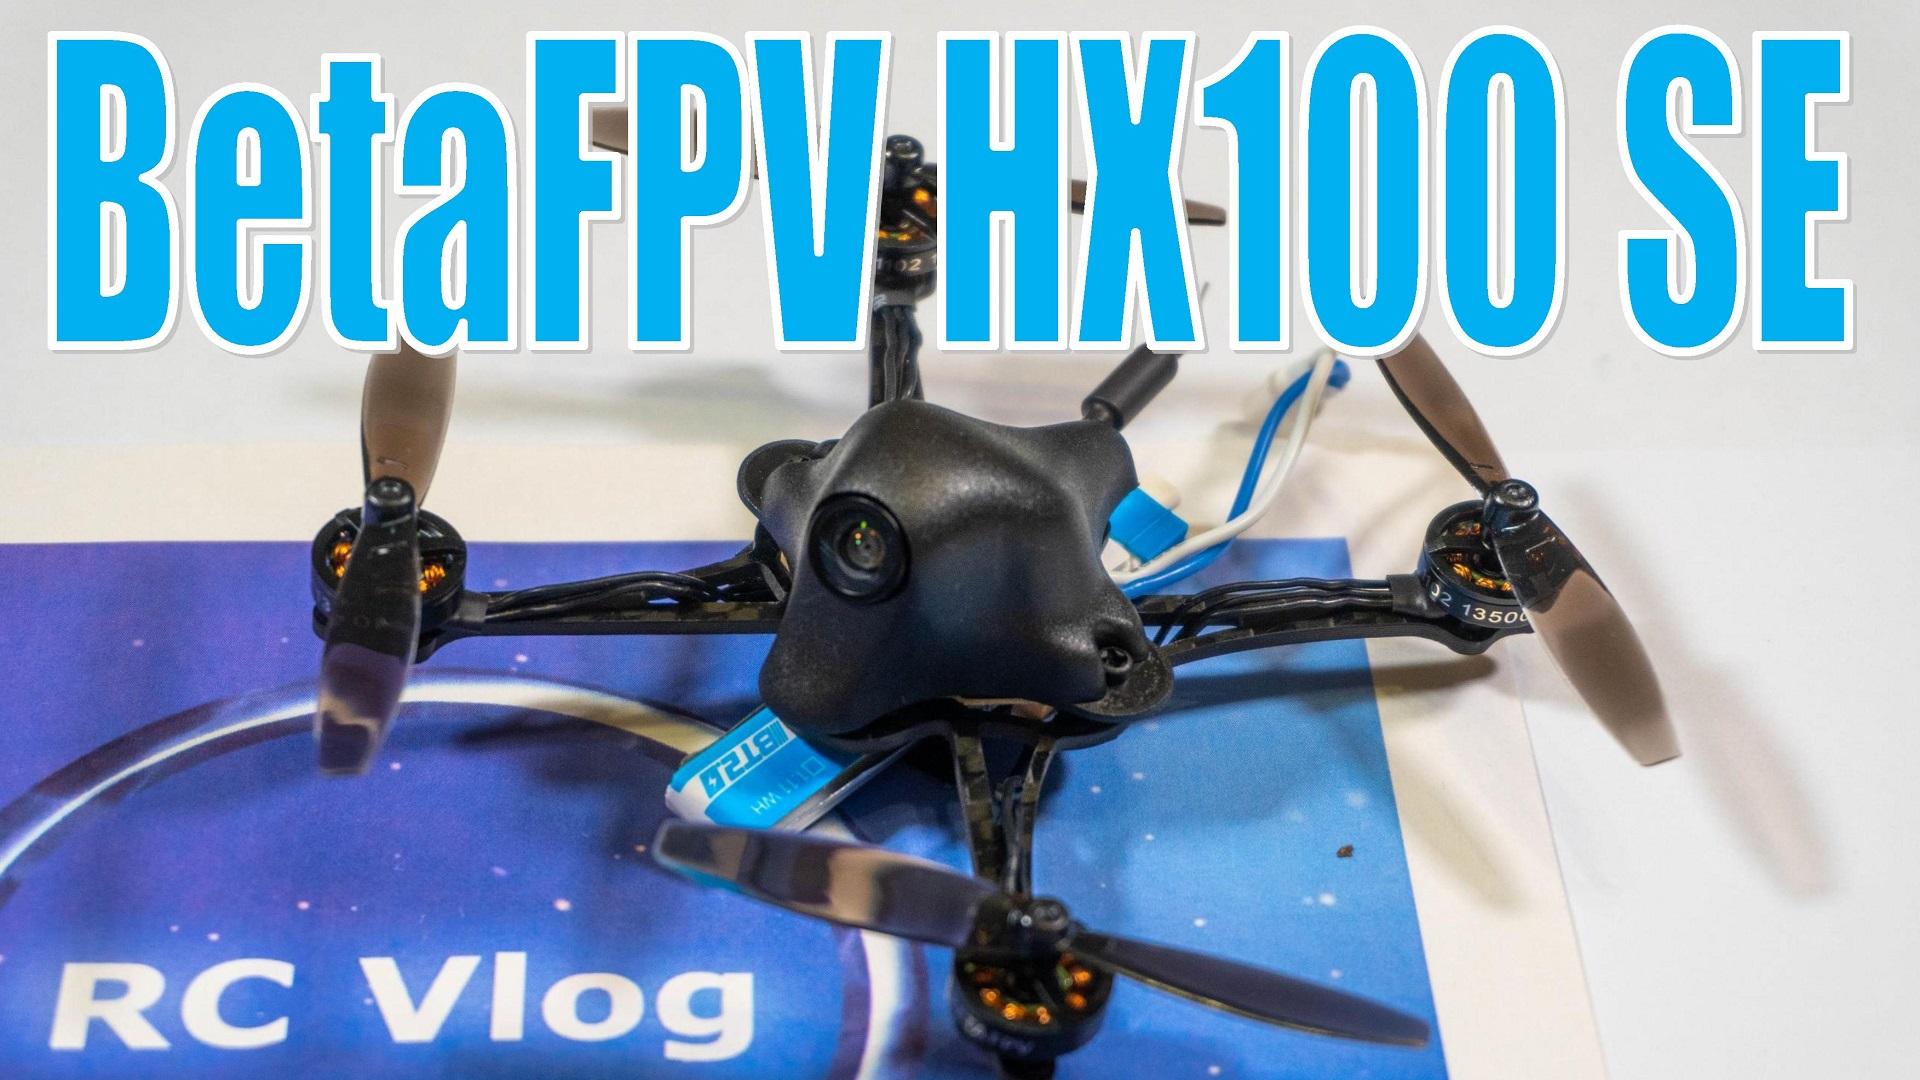 BETAFPV HX100 SE 100 мм F4 OSD AIO 5A ESC 1S Зубочистка FPV Racing Дрон PNP BNFw / 1102 13500KV Мотор M01 камера 600TVL AIO 25 мВт VTX V2.1